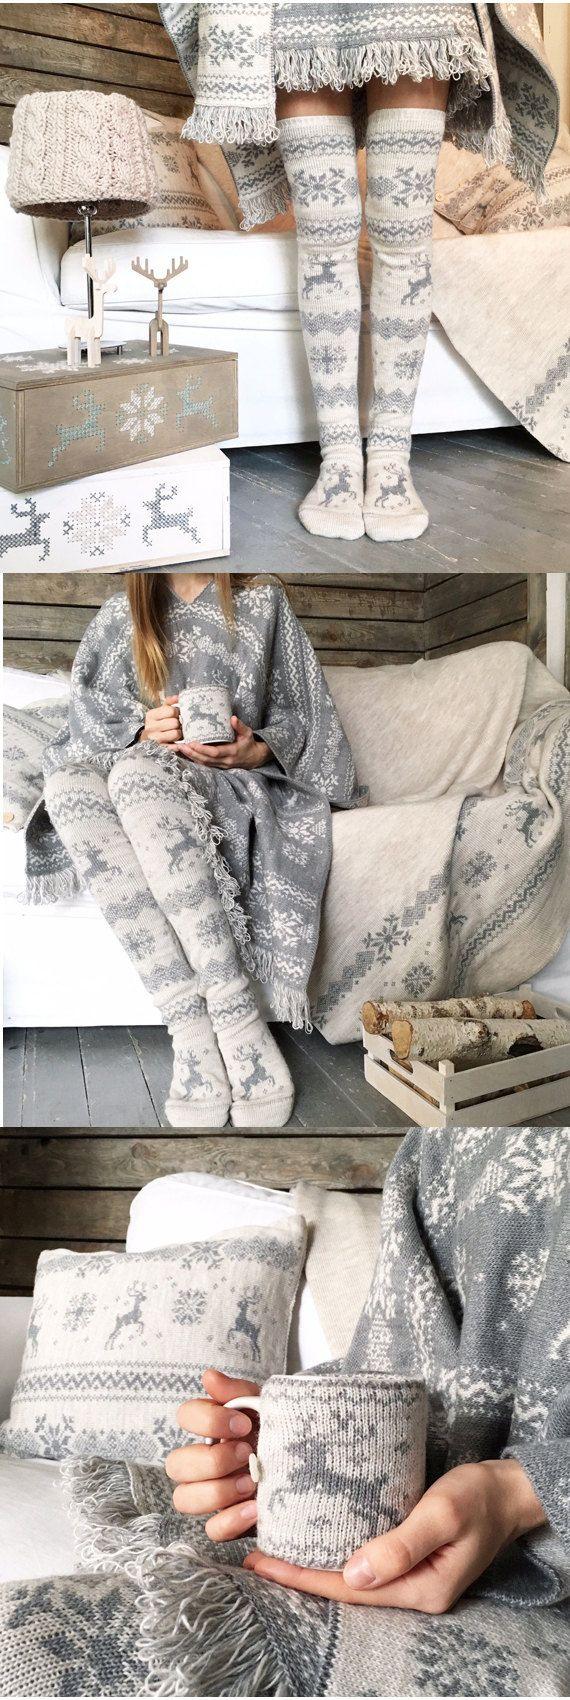 We need these warm knee socks!